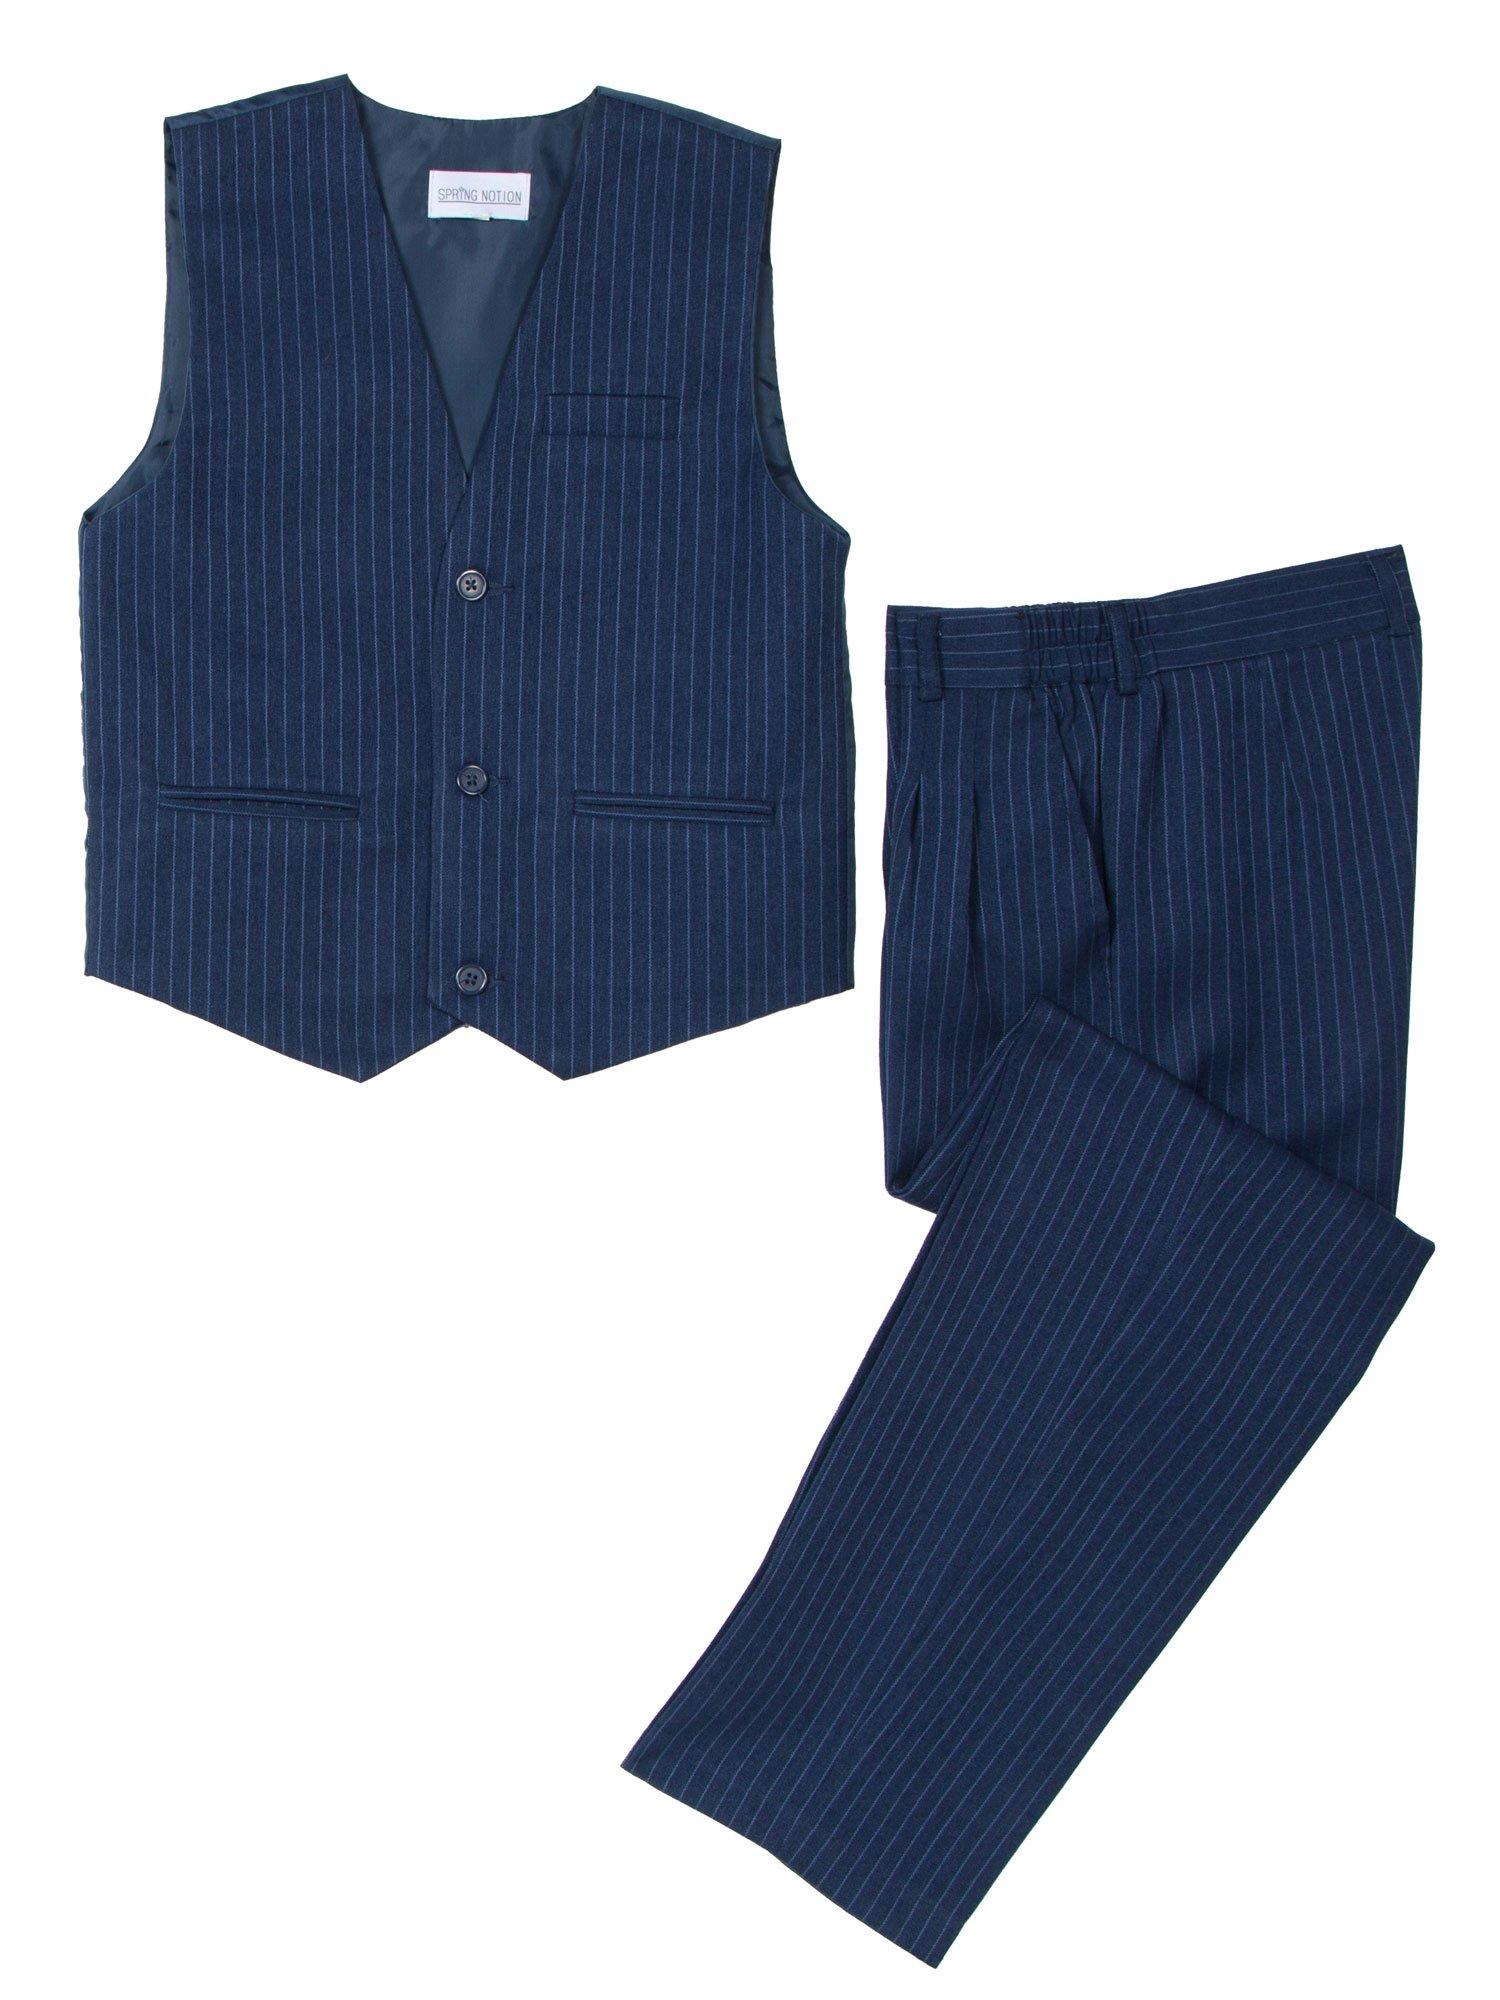 Spring Notion Little Boys' 2 Piece Pinstripe Vest Set 6 Blue